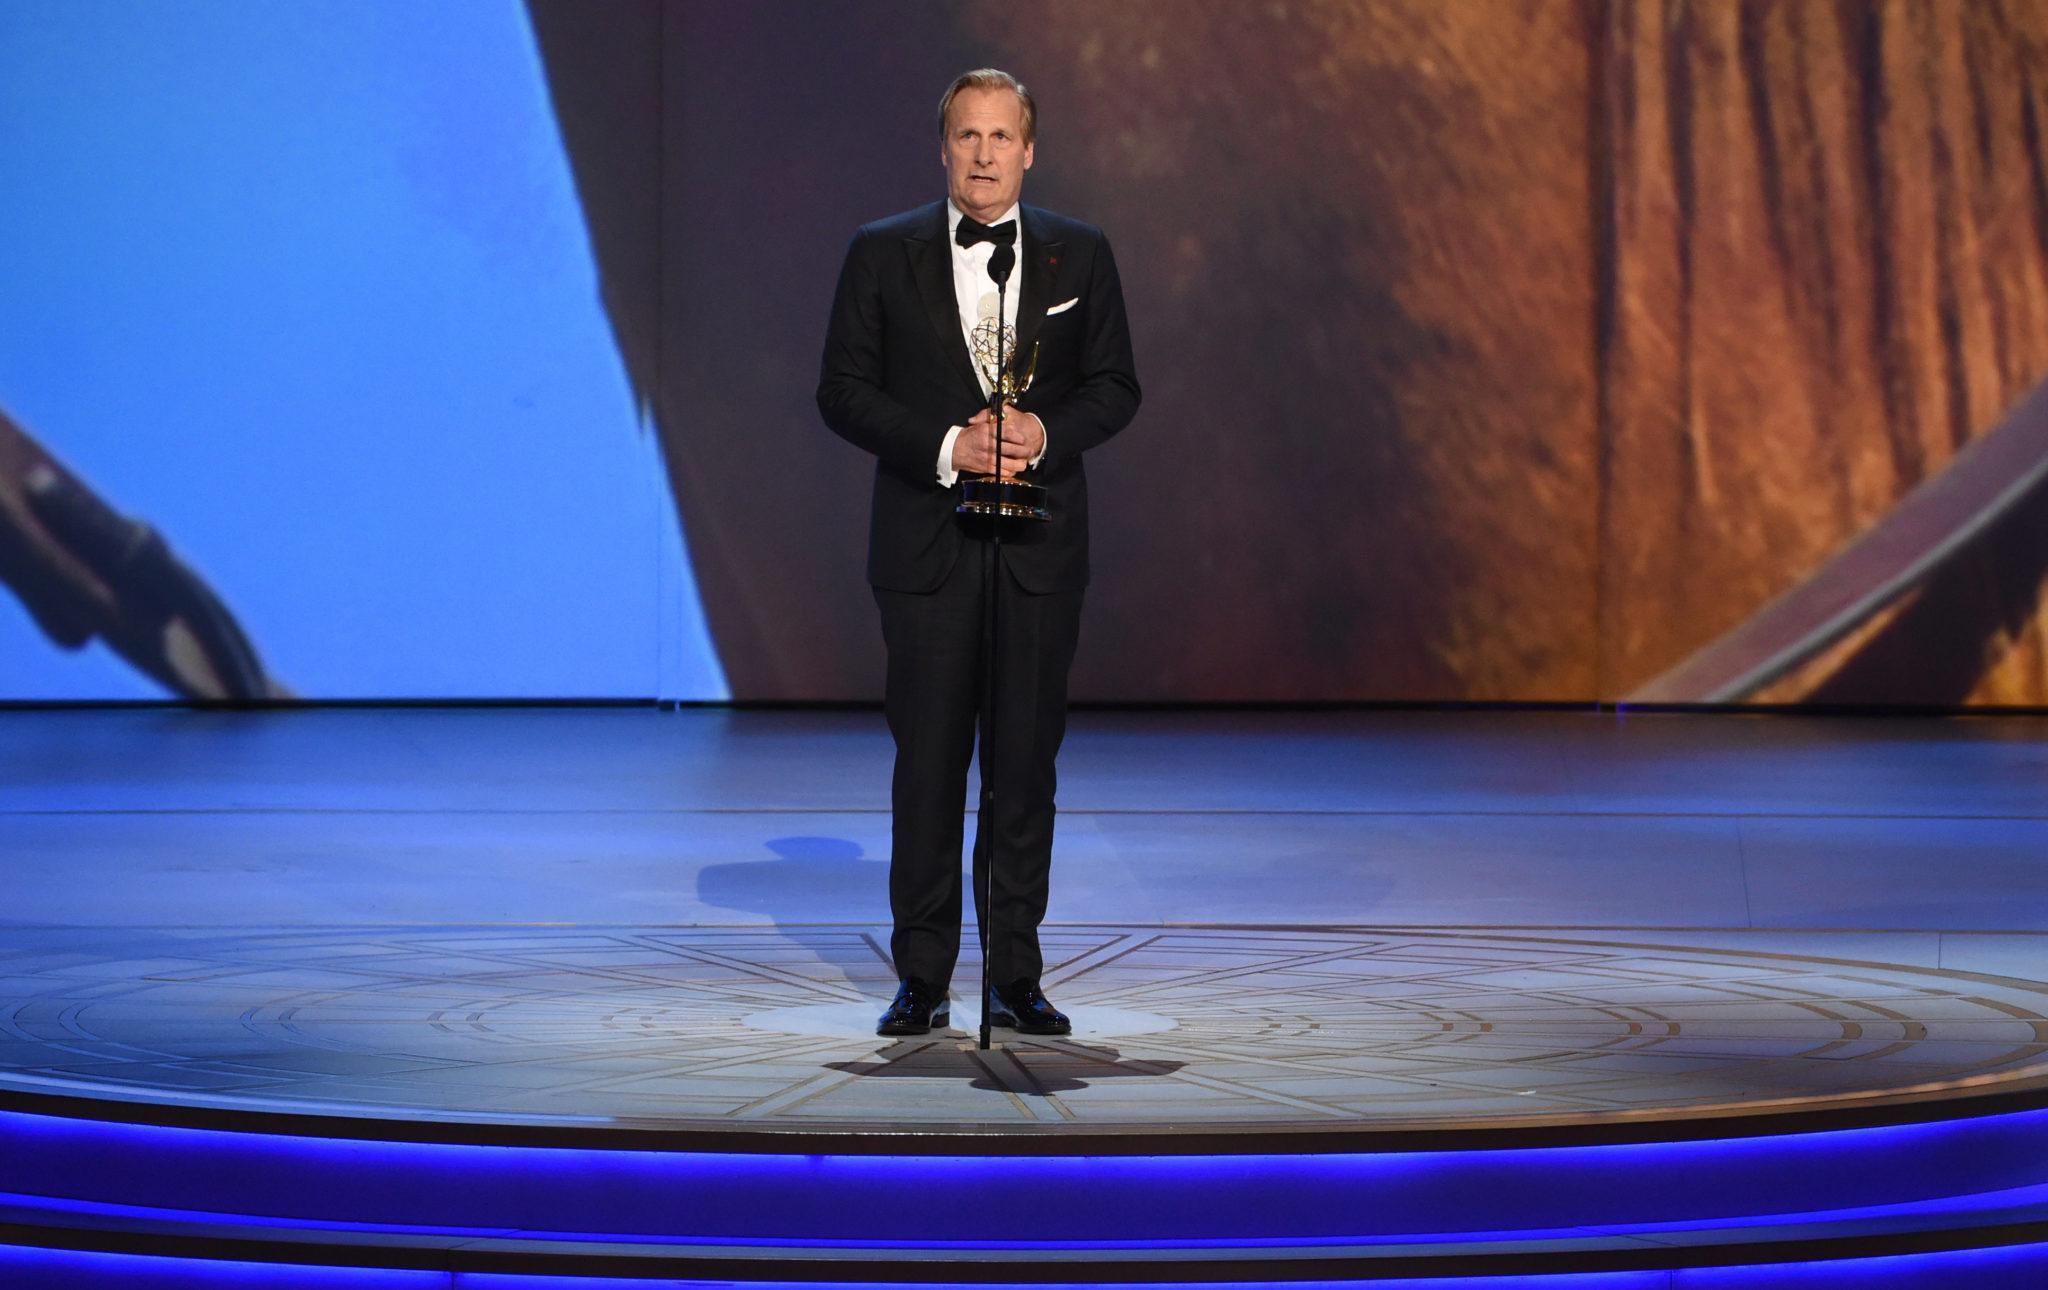 Jeff Daniels Emmys 4Chion Lifestyle